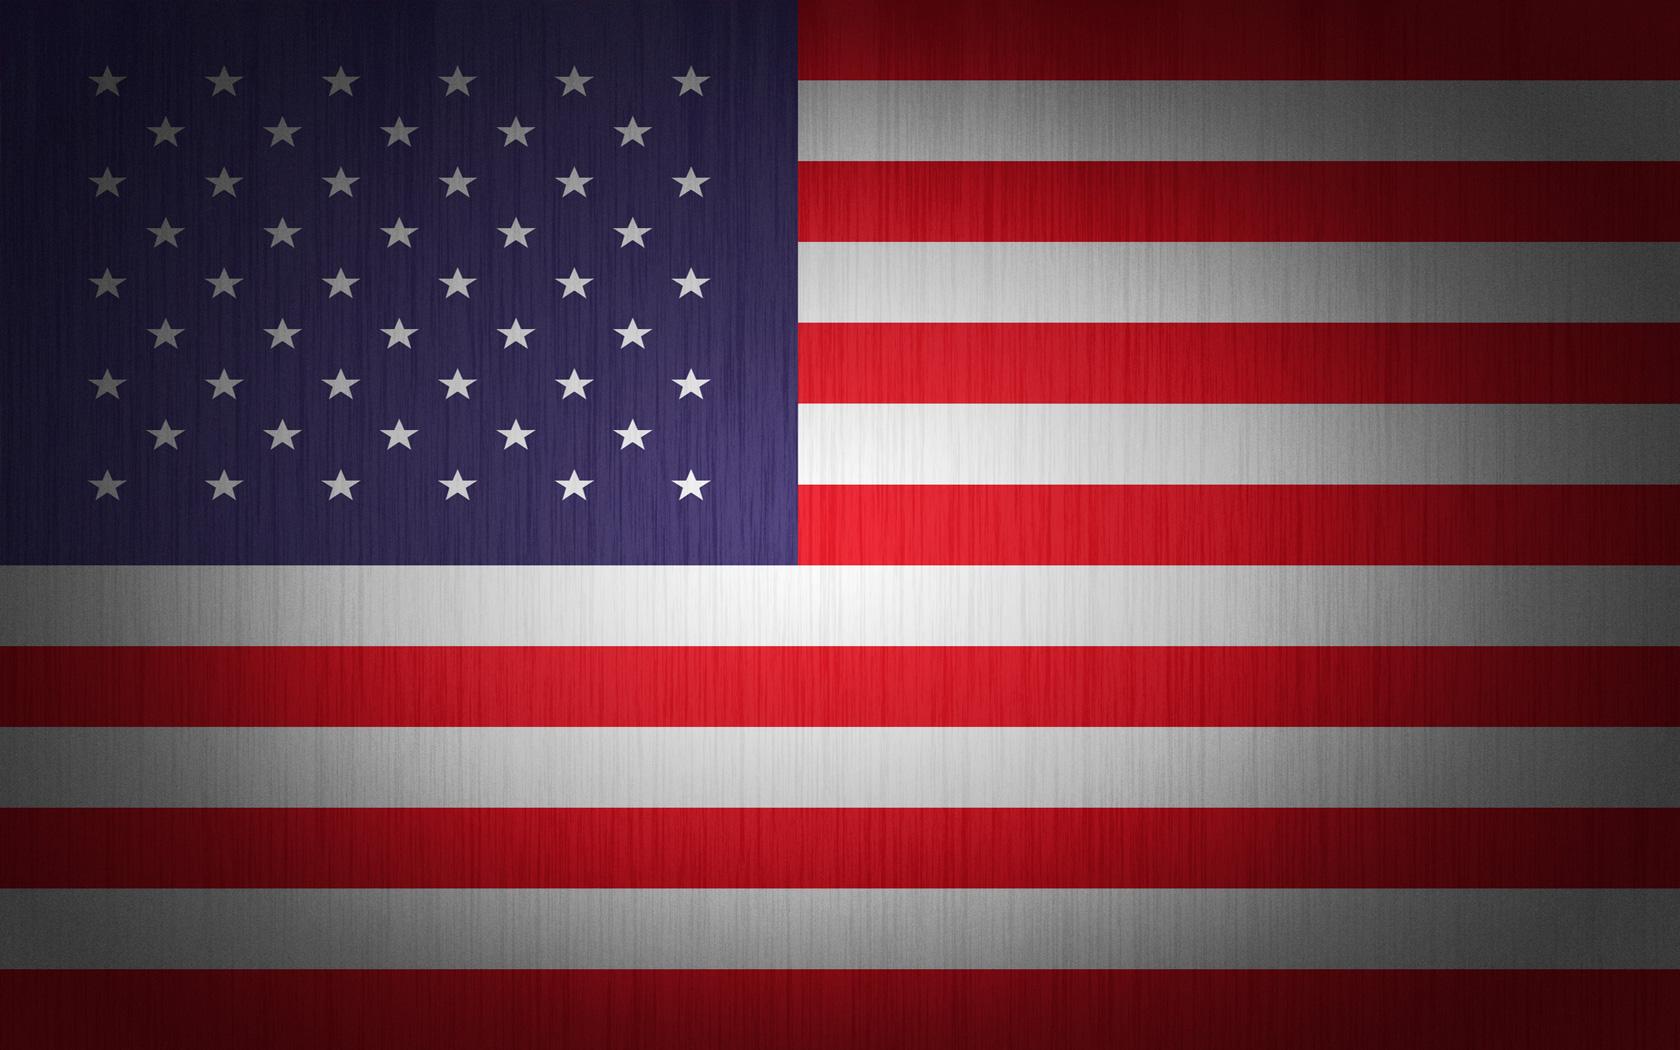 USA Flag Wallpapers HD Wallpapers Pulse 1680x1050